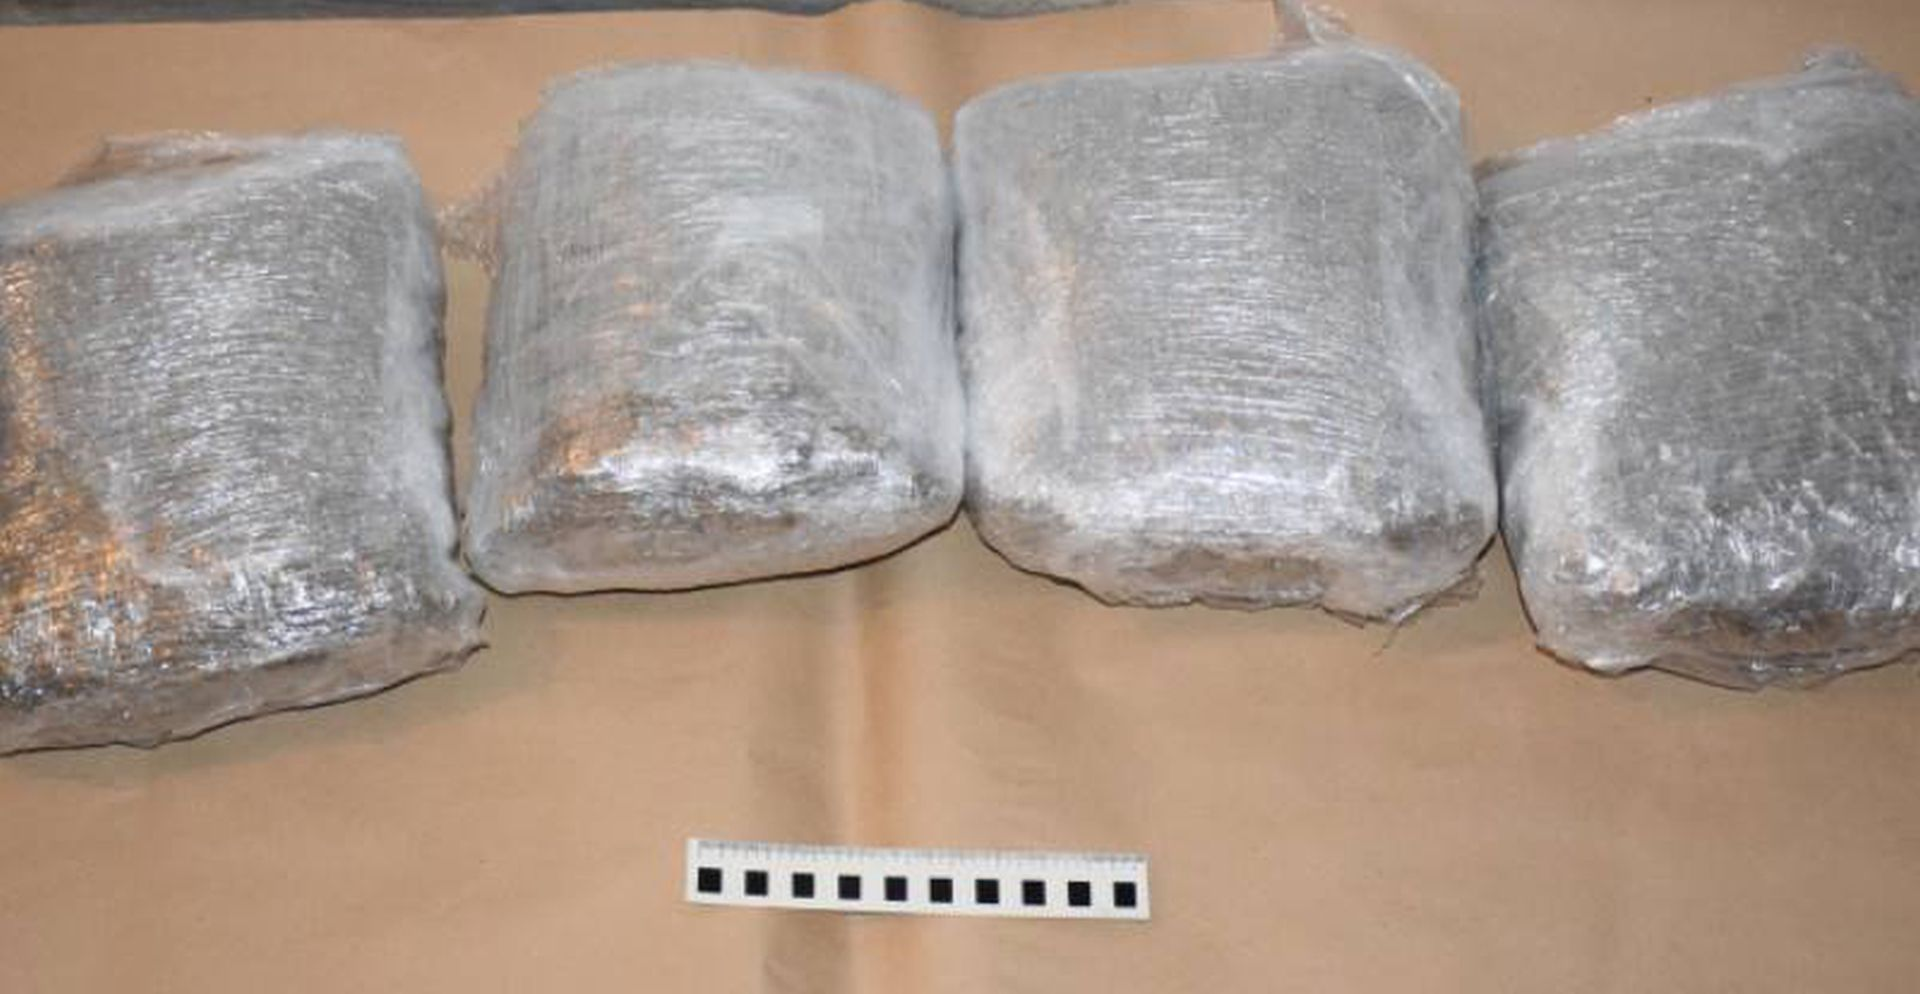 Zagrebačka policija zaplijenila oko 150 kg razne droge